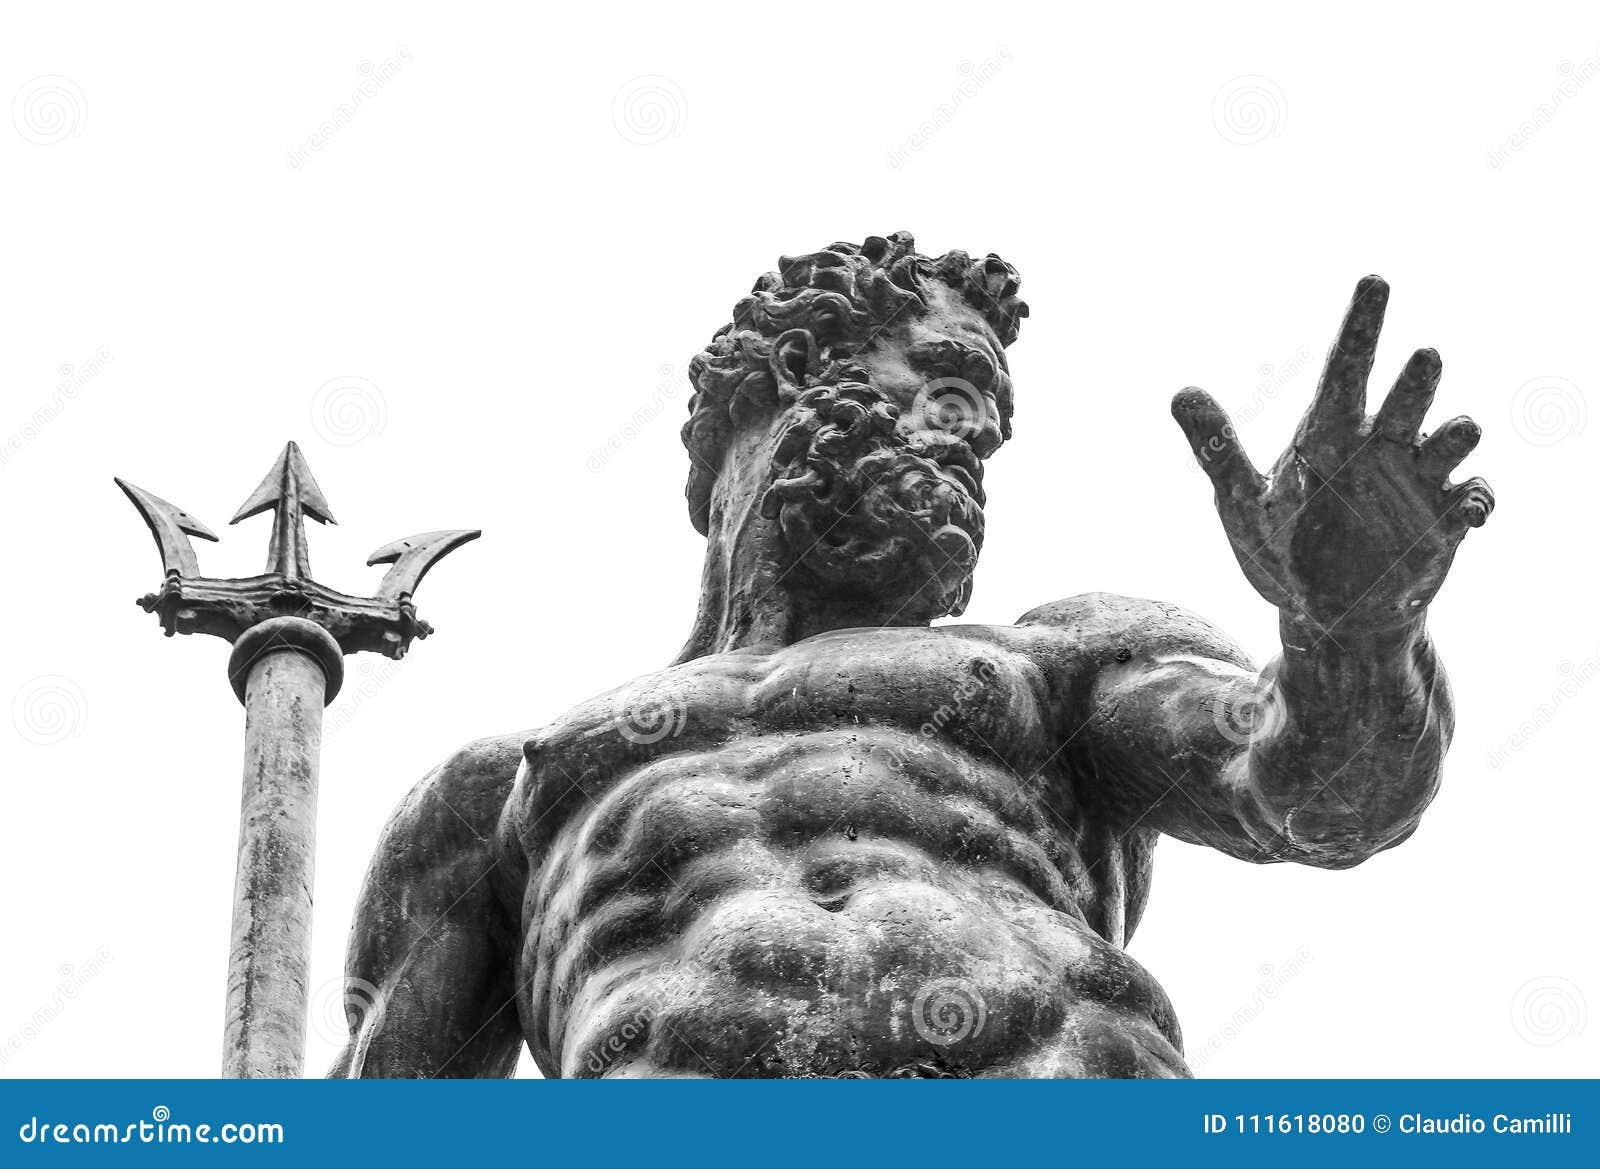 Neptune statue in firenze square